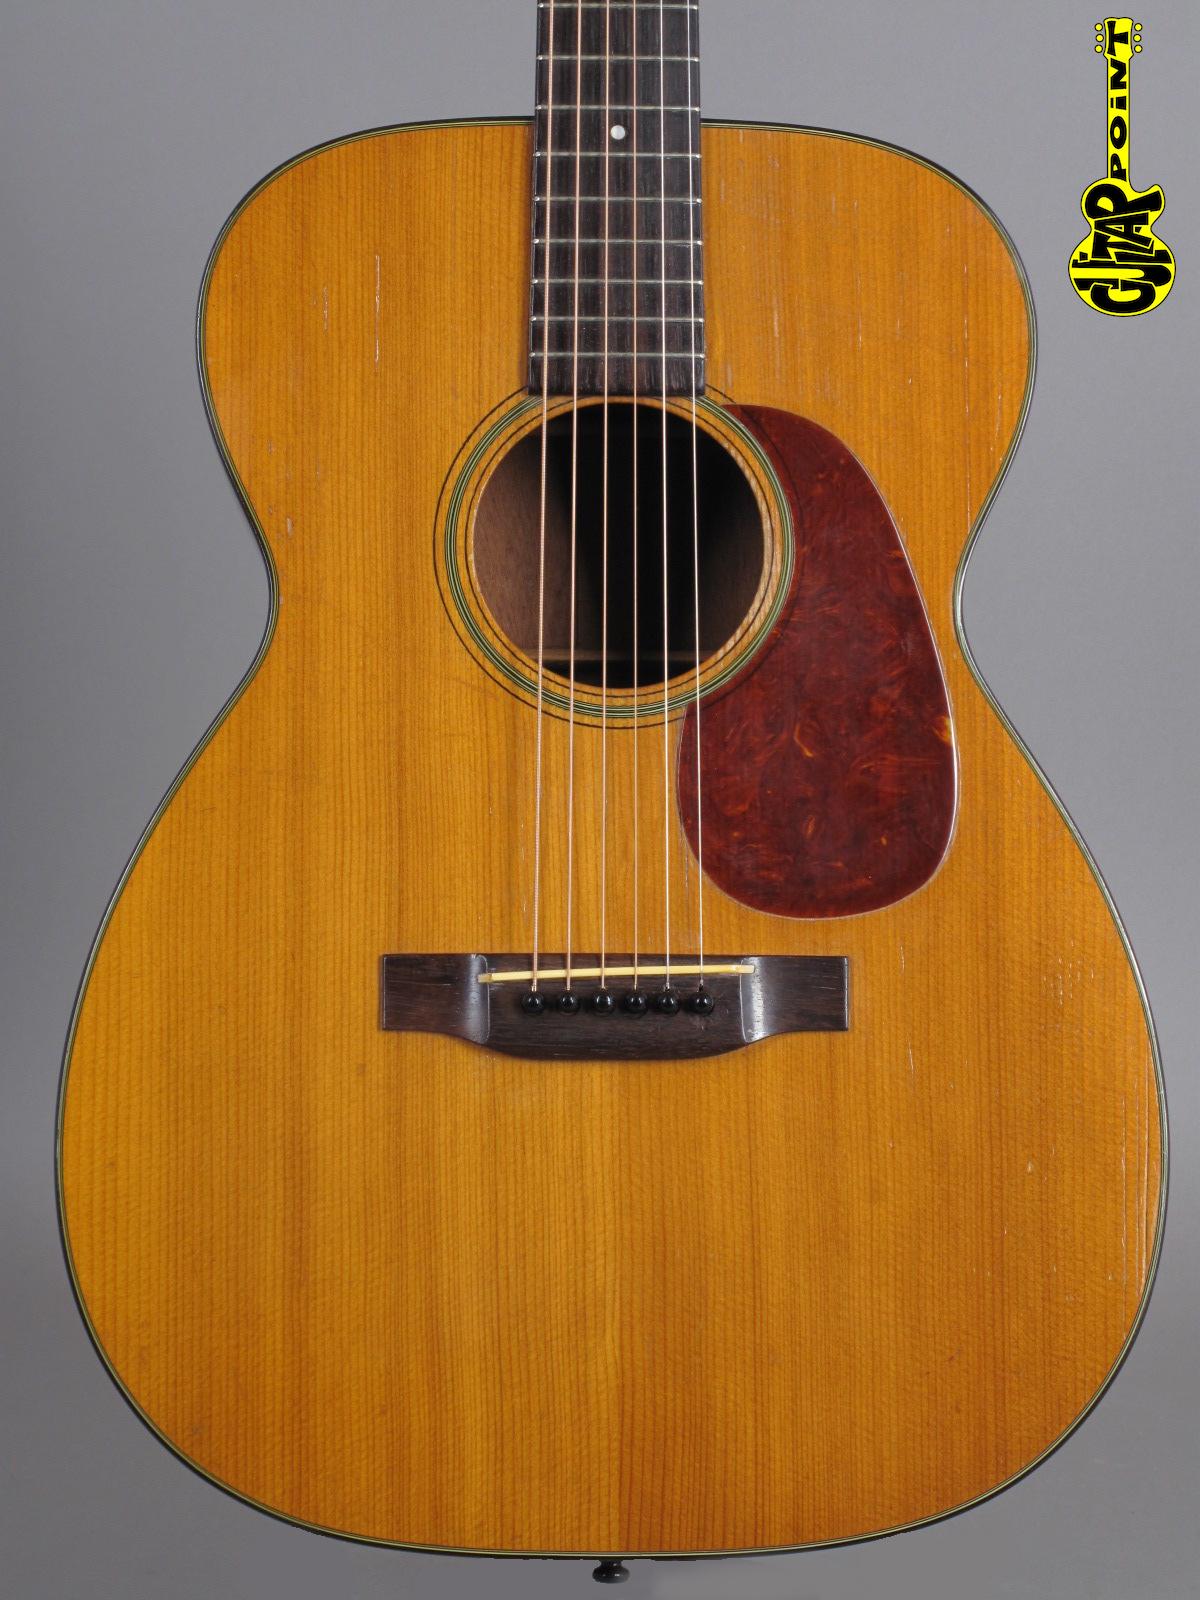 1948 Martin 00-18 - Natural